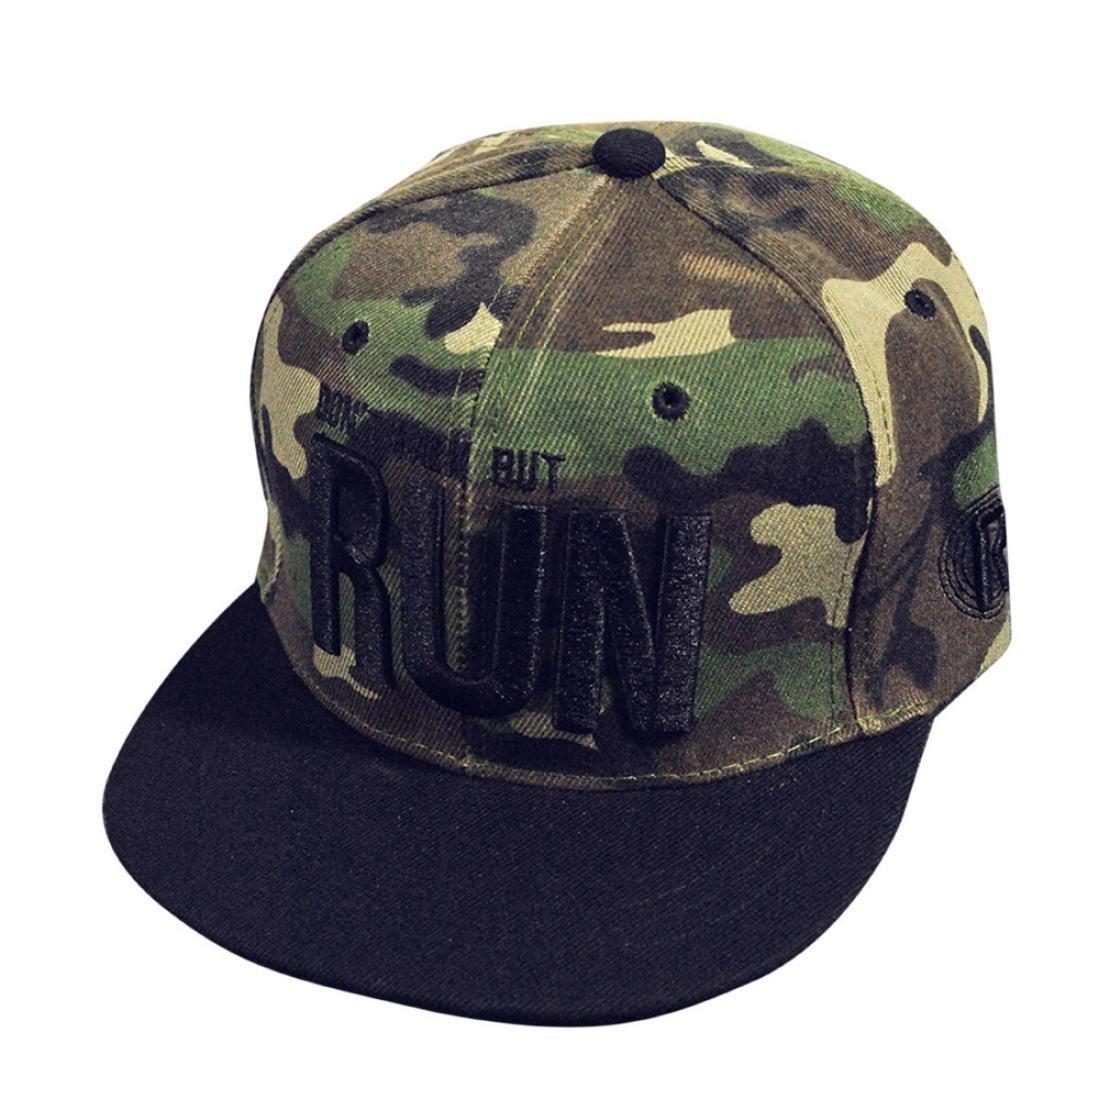 Amlaiworld Hiphop cappello, Moda ricamo Snapback Boy Hiphop cappello regolabile Baseball Cap Unisex